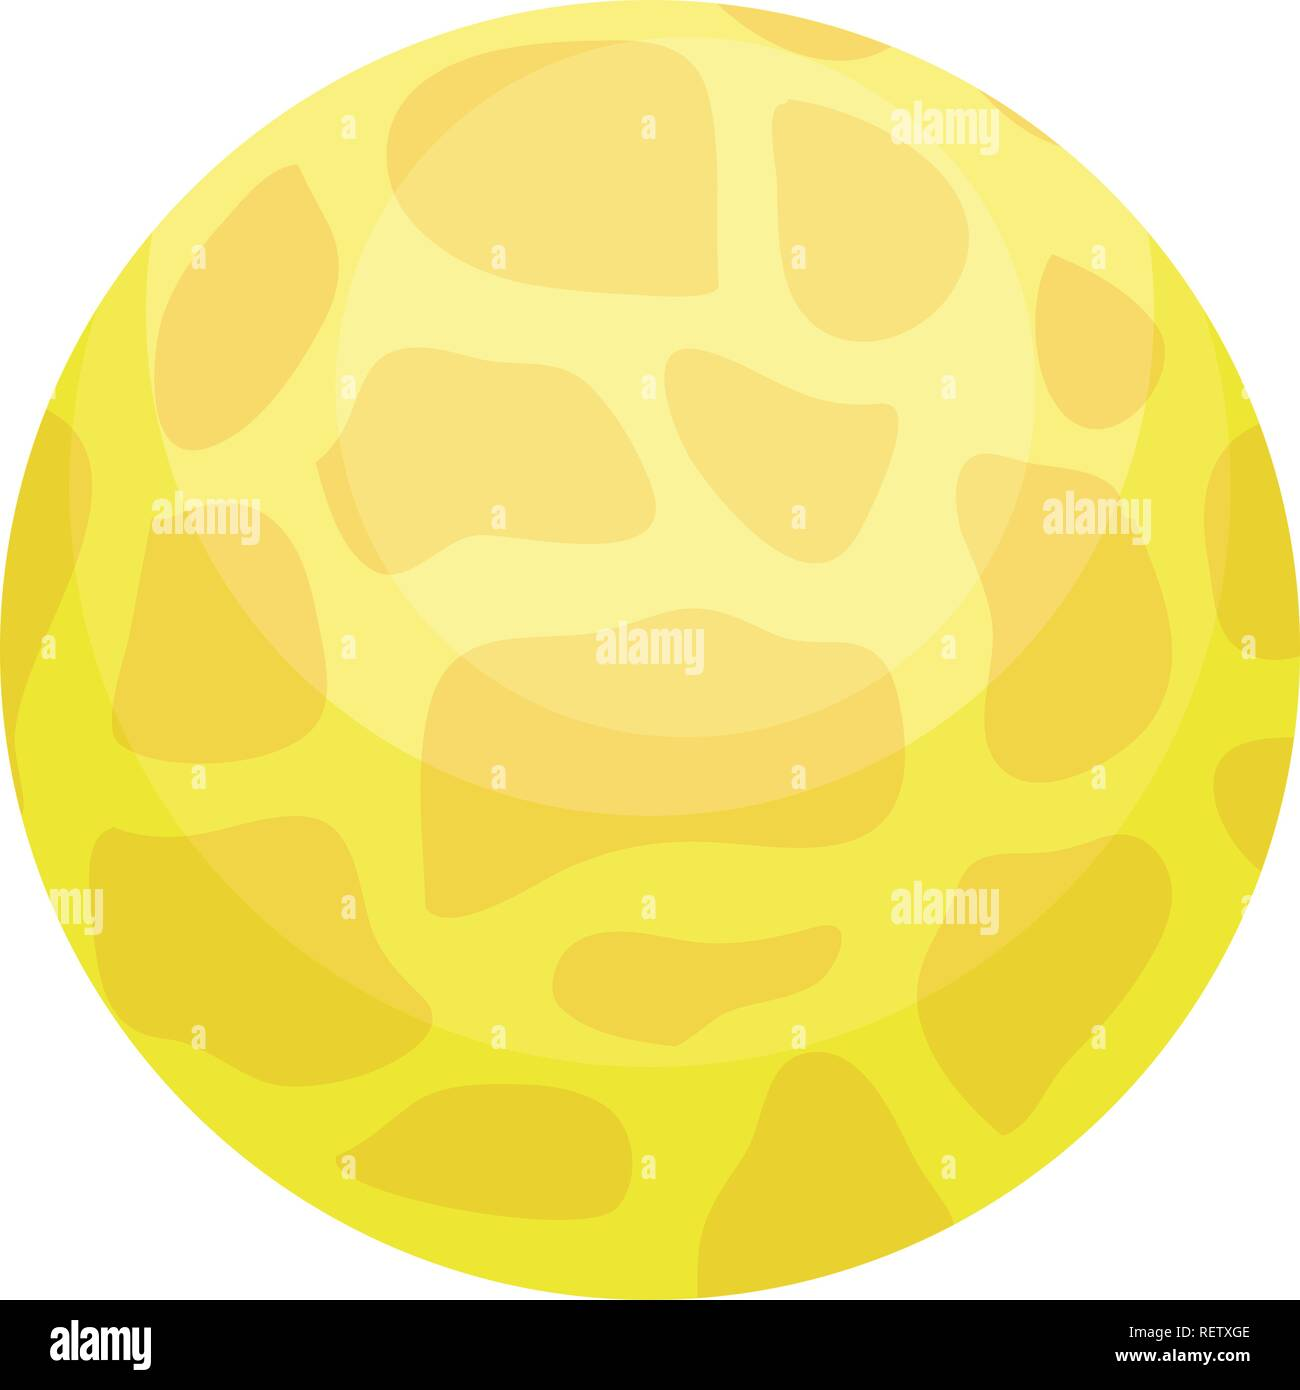 venus planet over white background, vector illustration - Stock Image